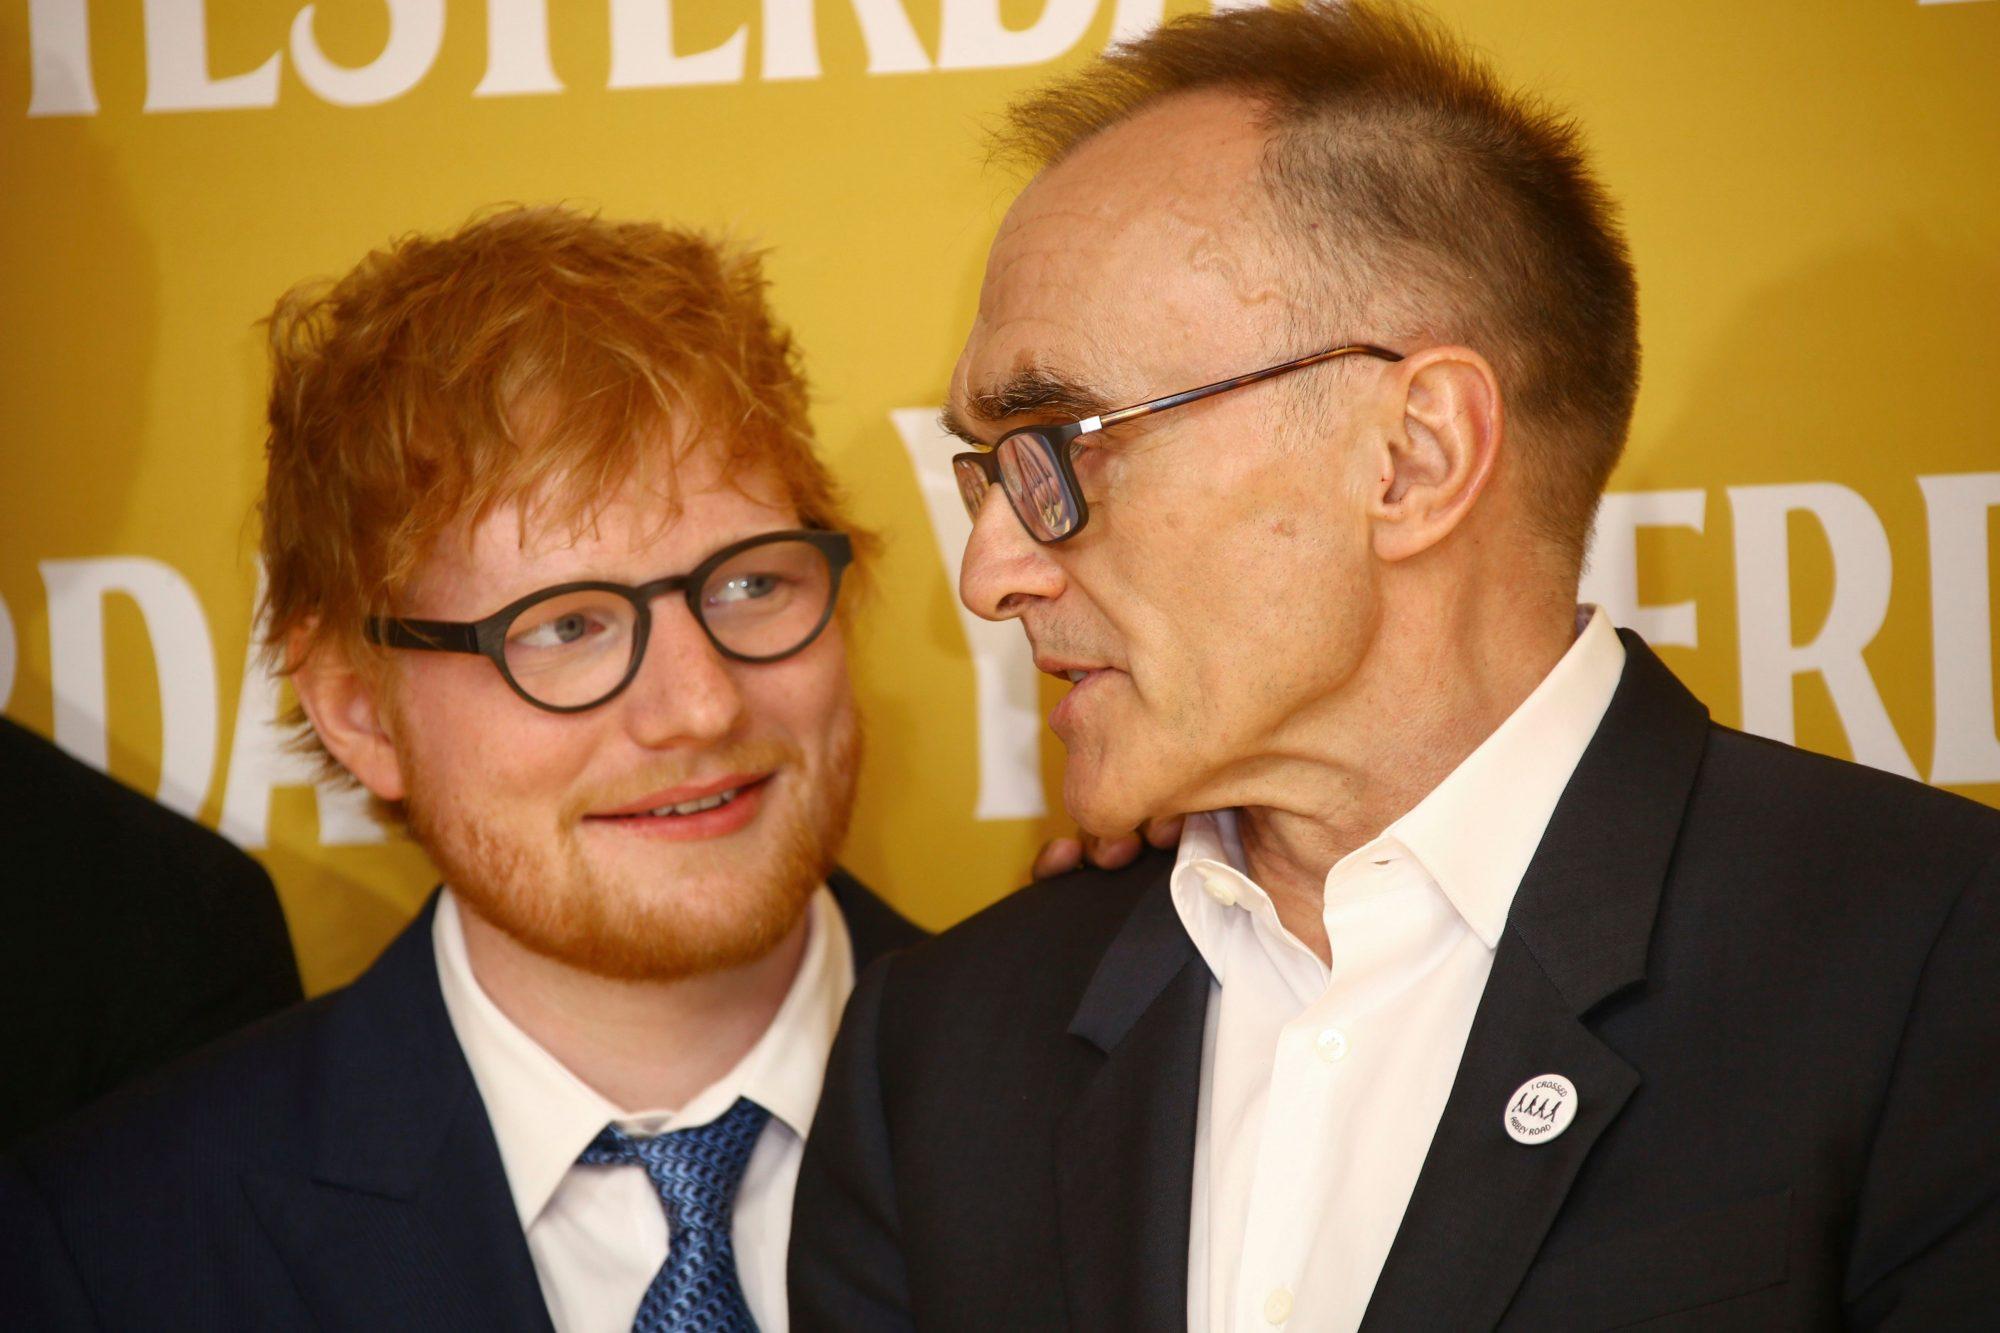 Ed Sheeran, Danny Boyle